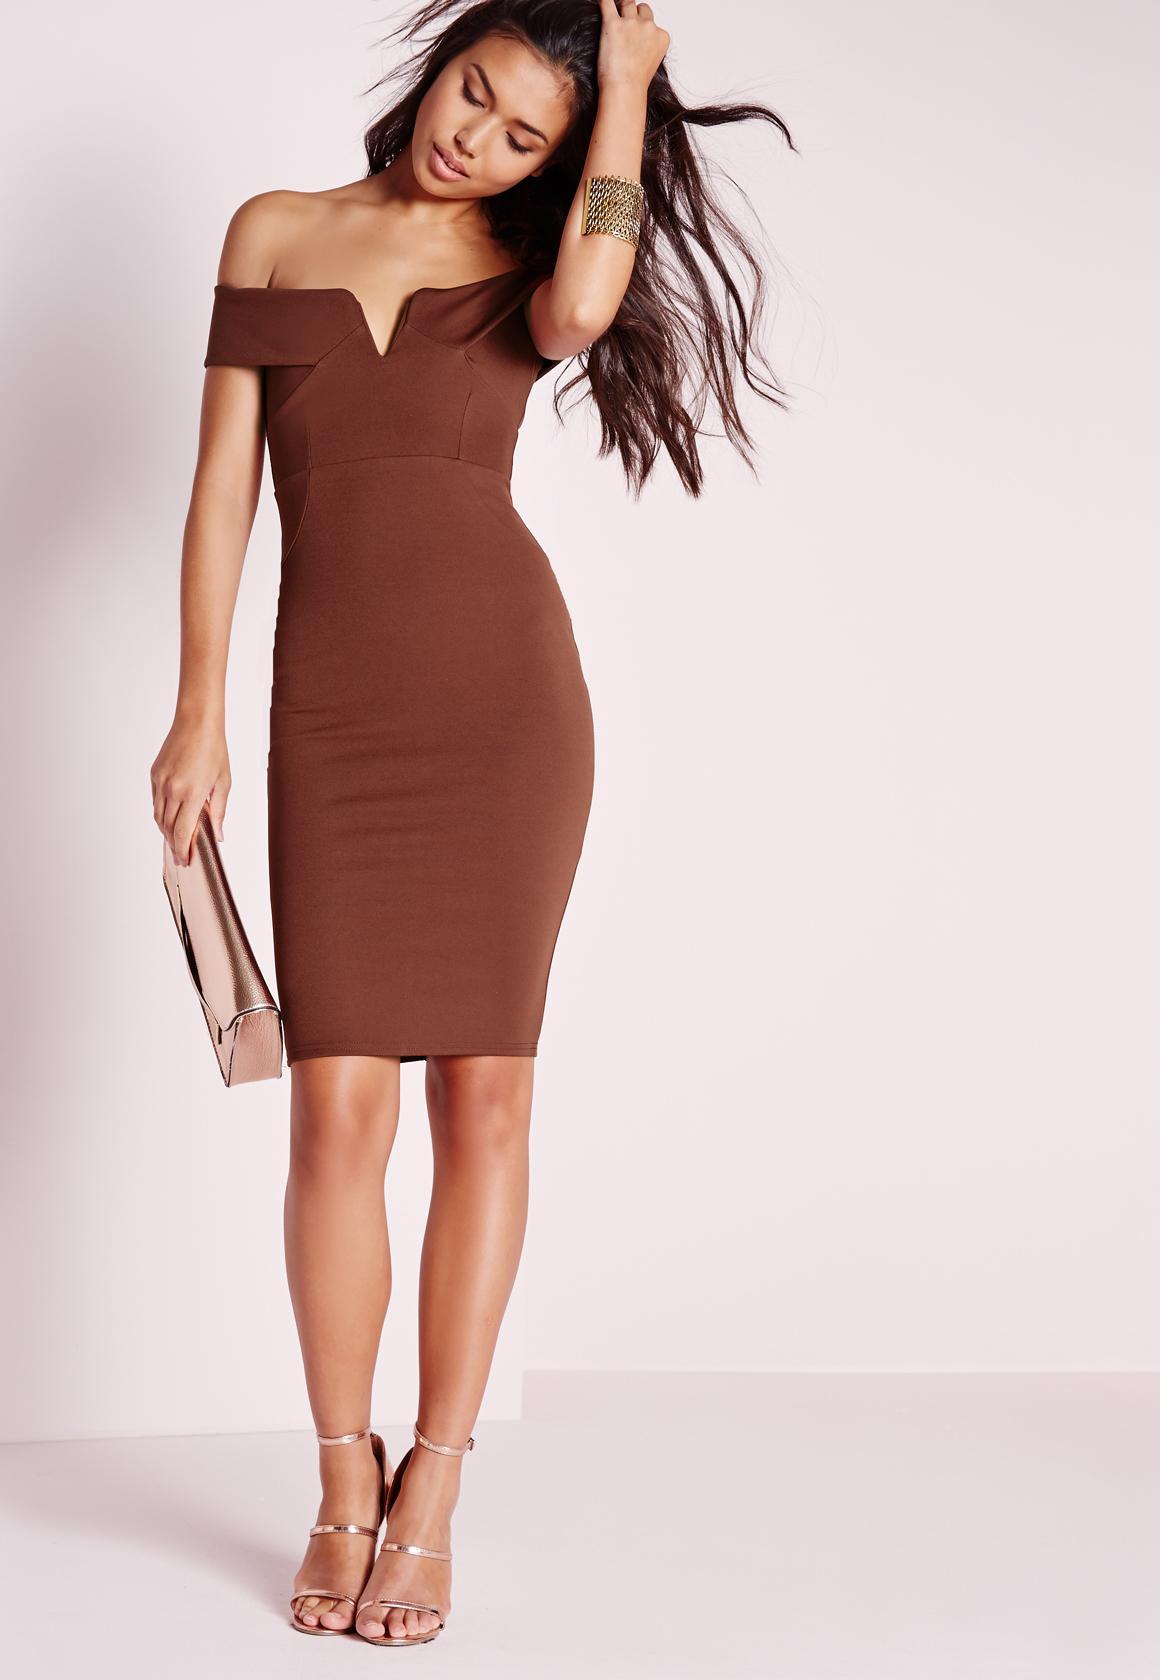 V Front Bardot Midi Dress Chocolate Missguided Timberland 14865xsbn 12 Coklat Rosegold